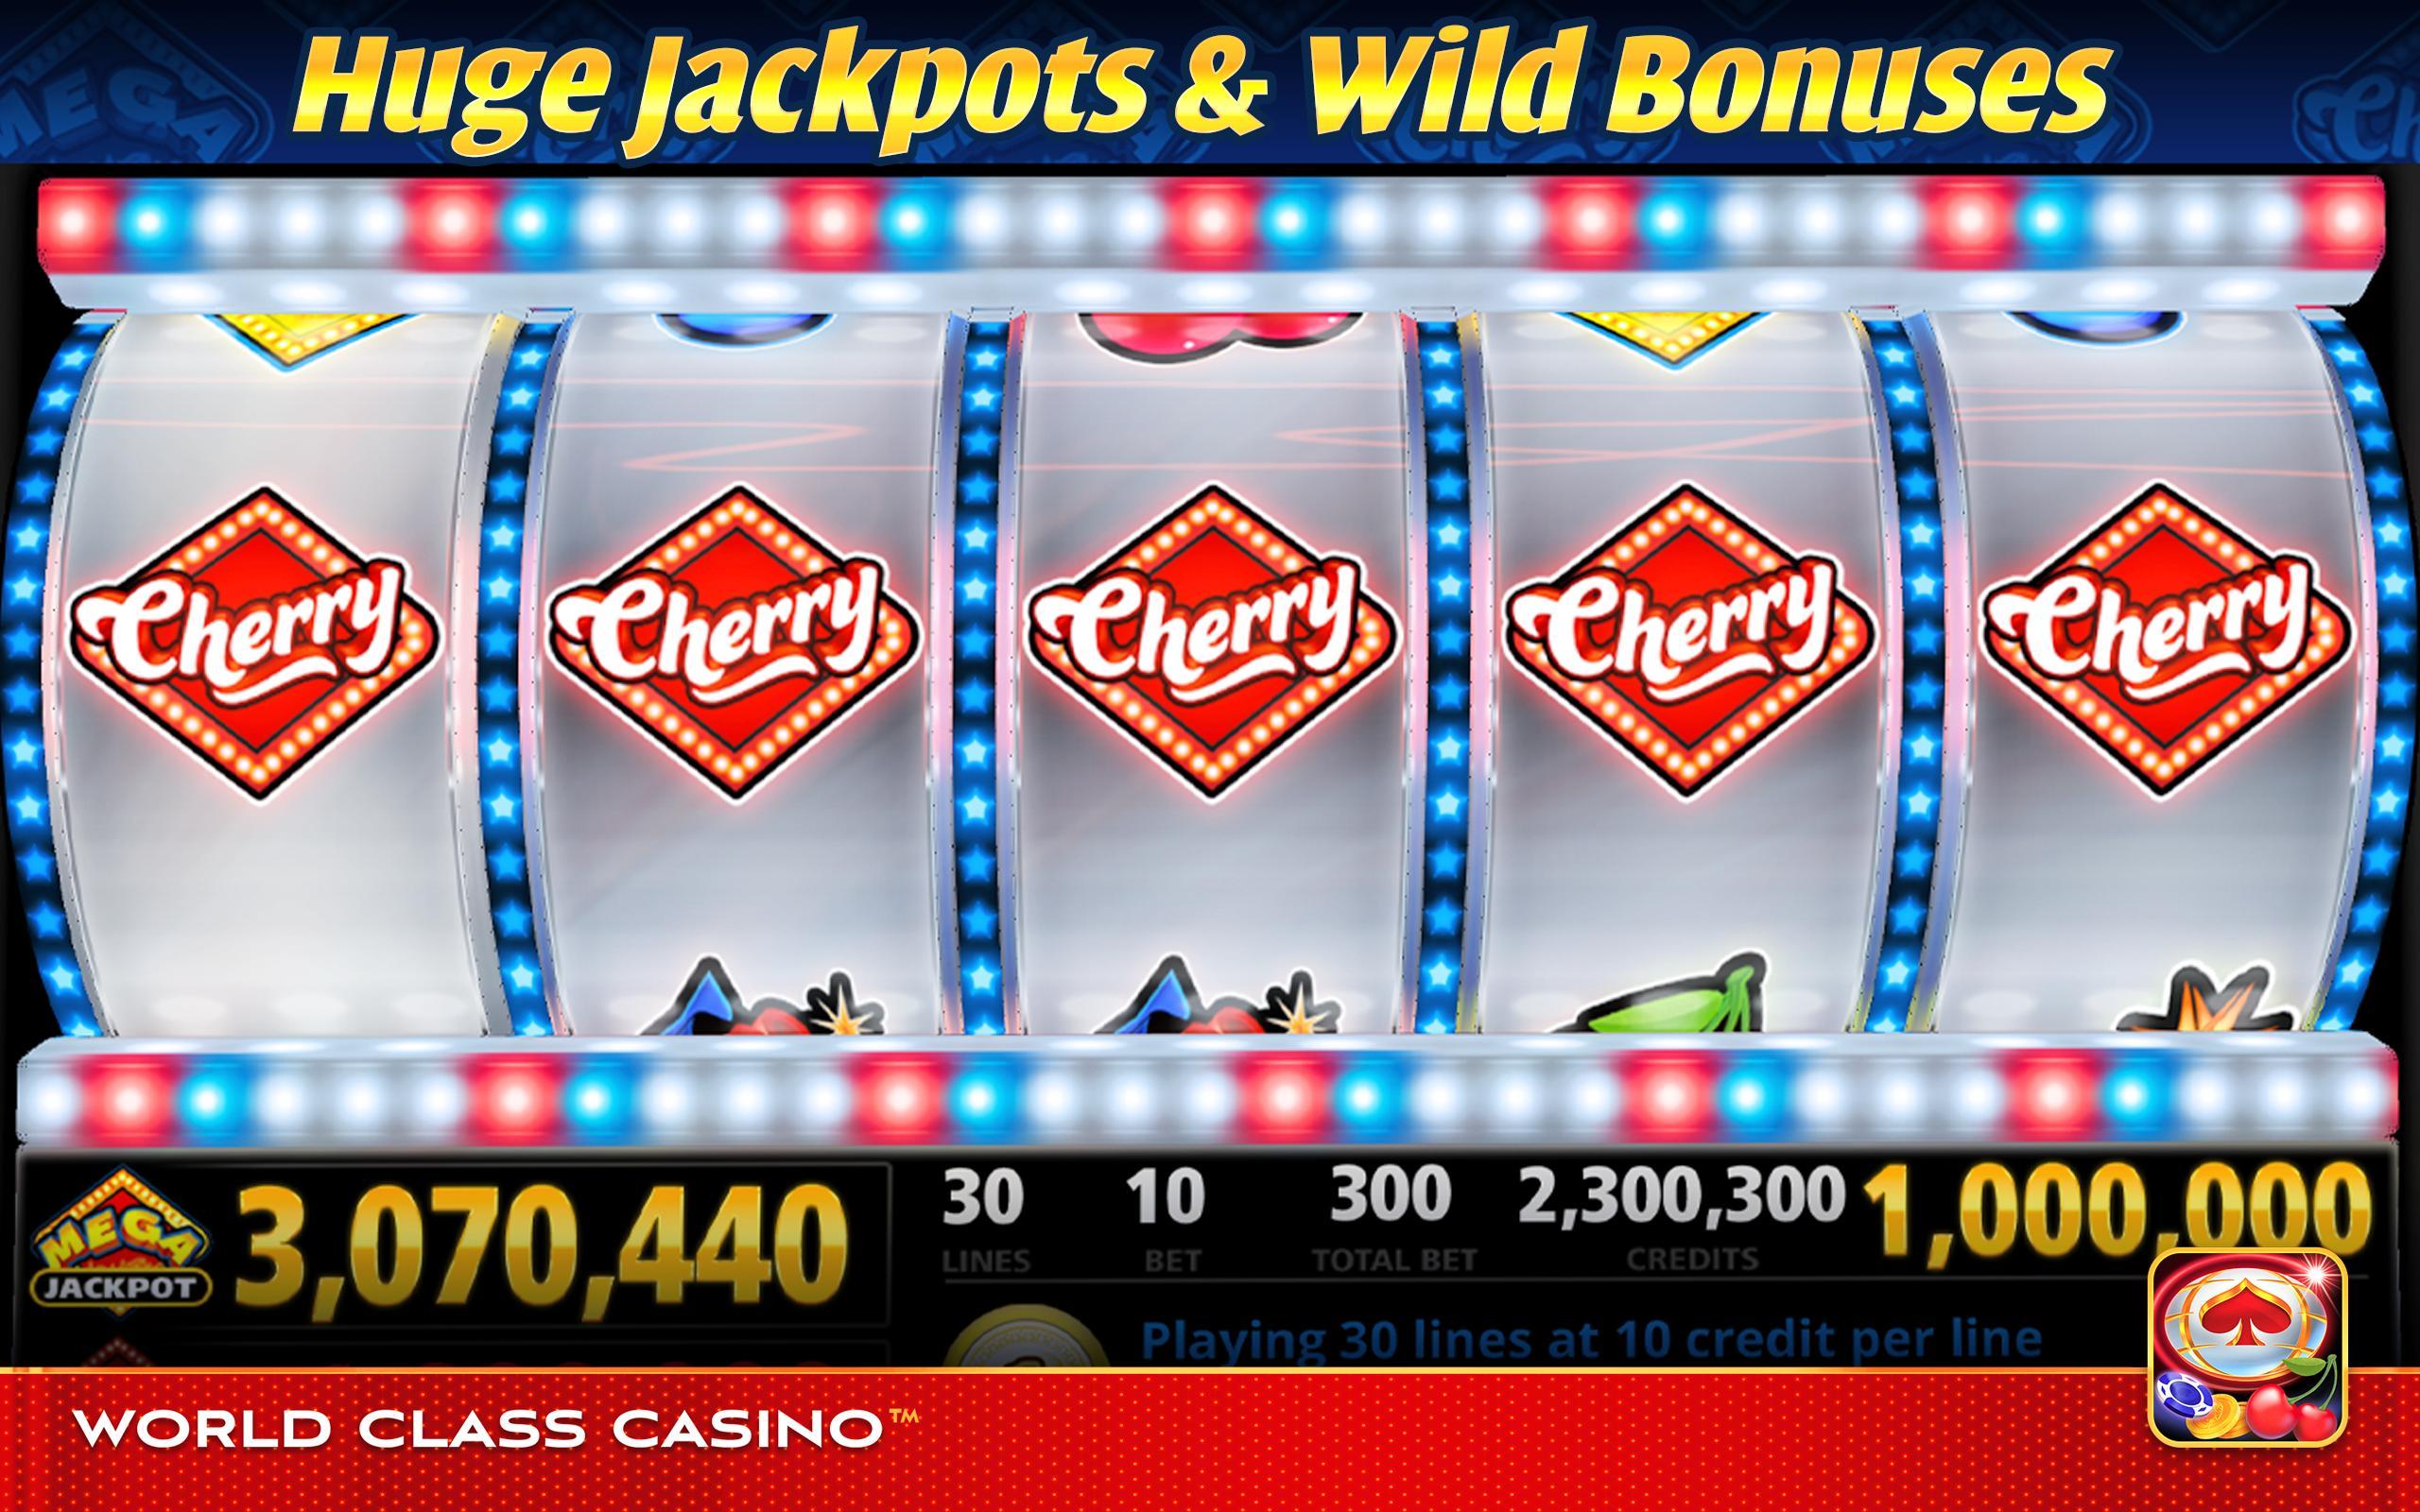 World Class Casino Slots, Blackjack & Poker Room 8.0.4 Screenshot 16